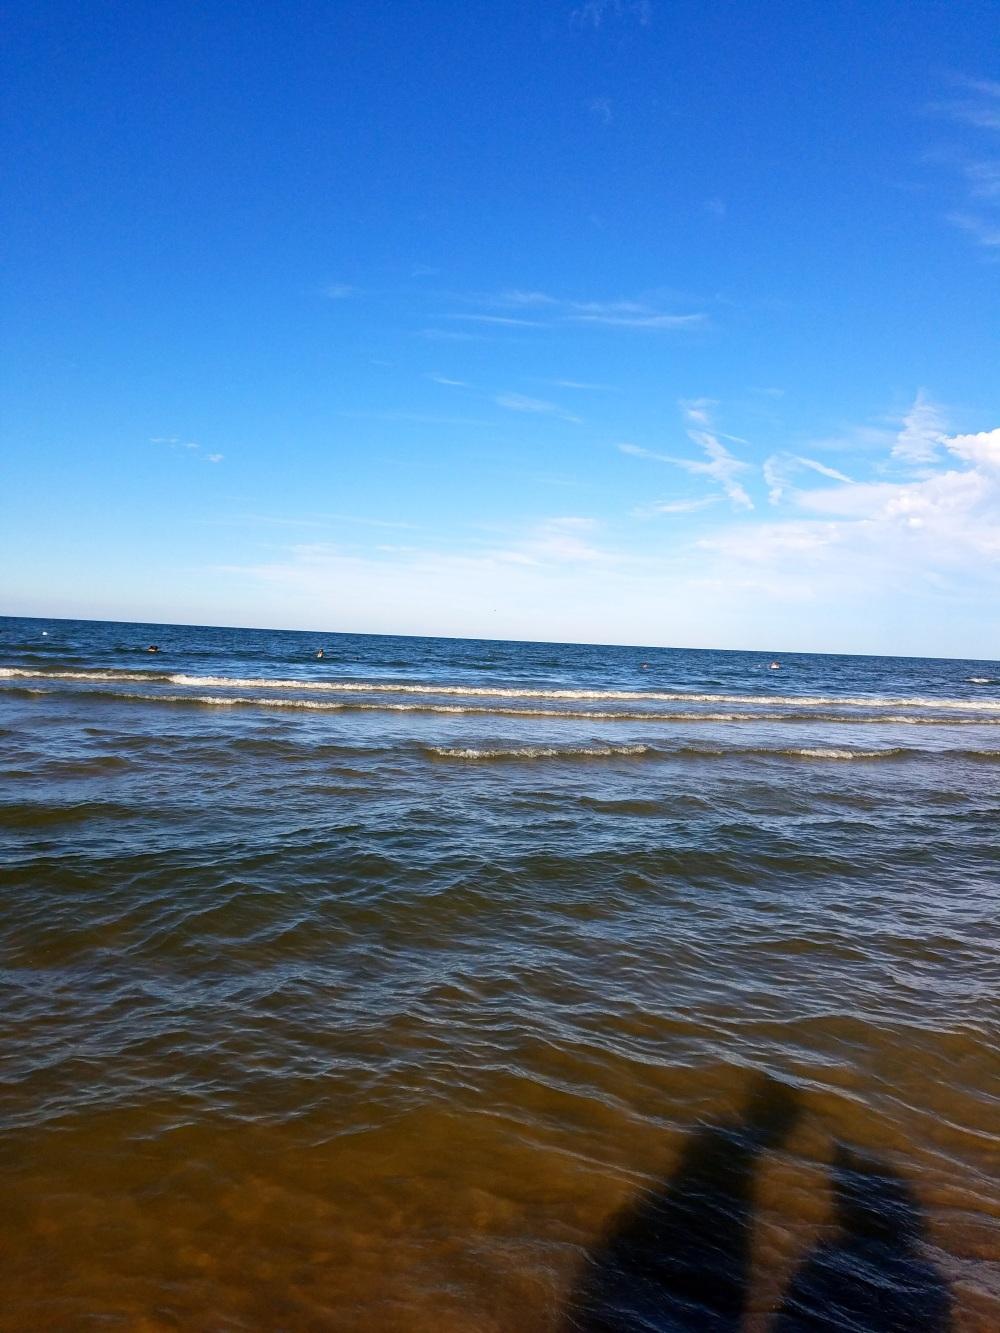 #BeachGoals